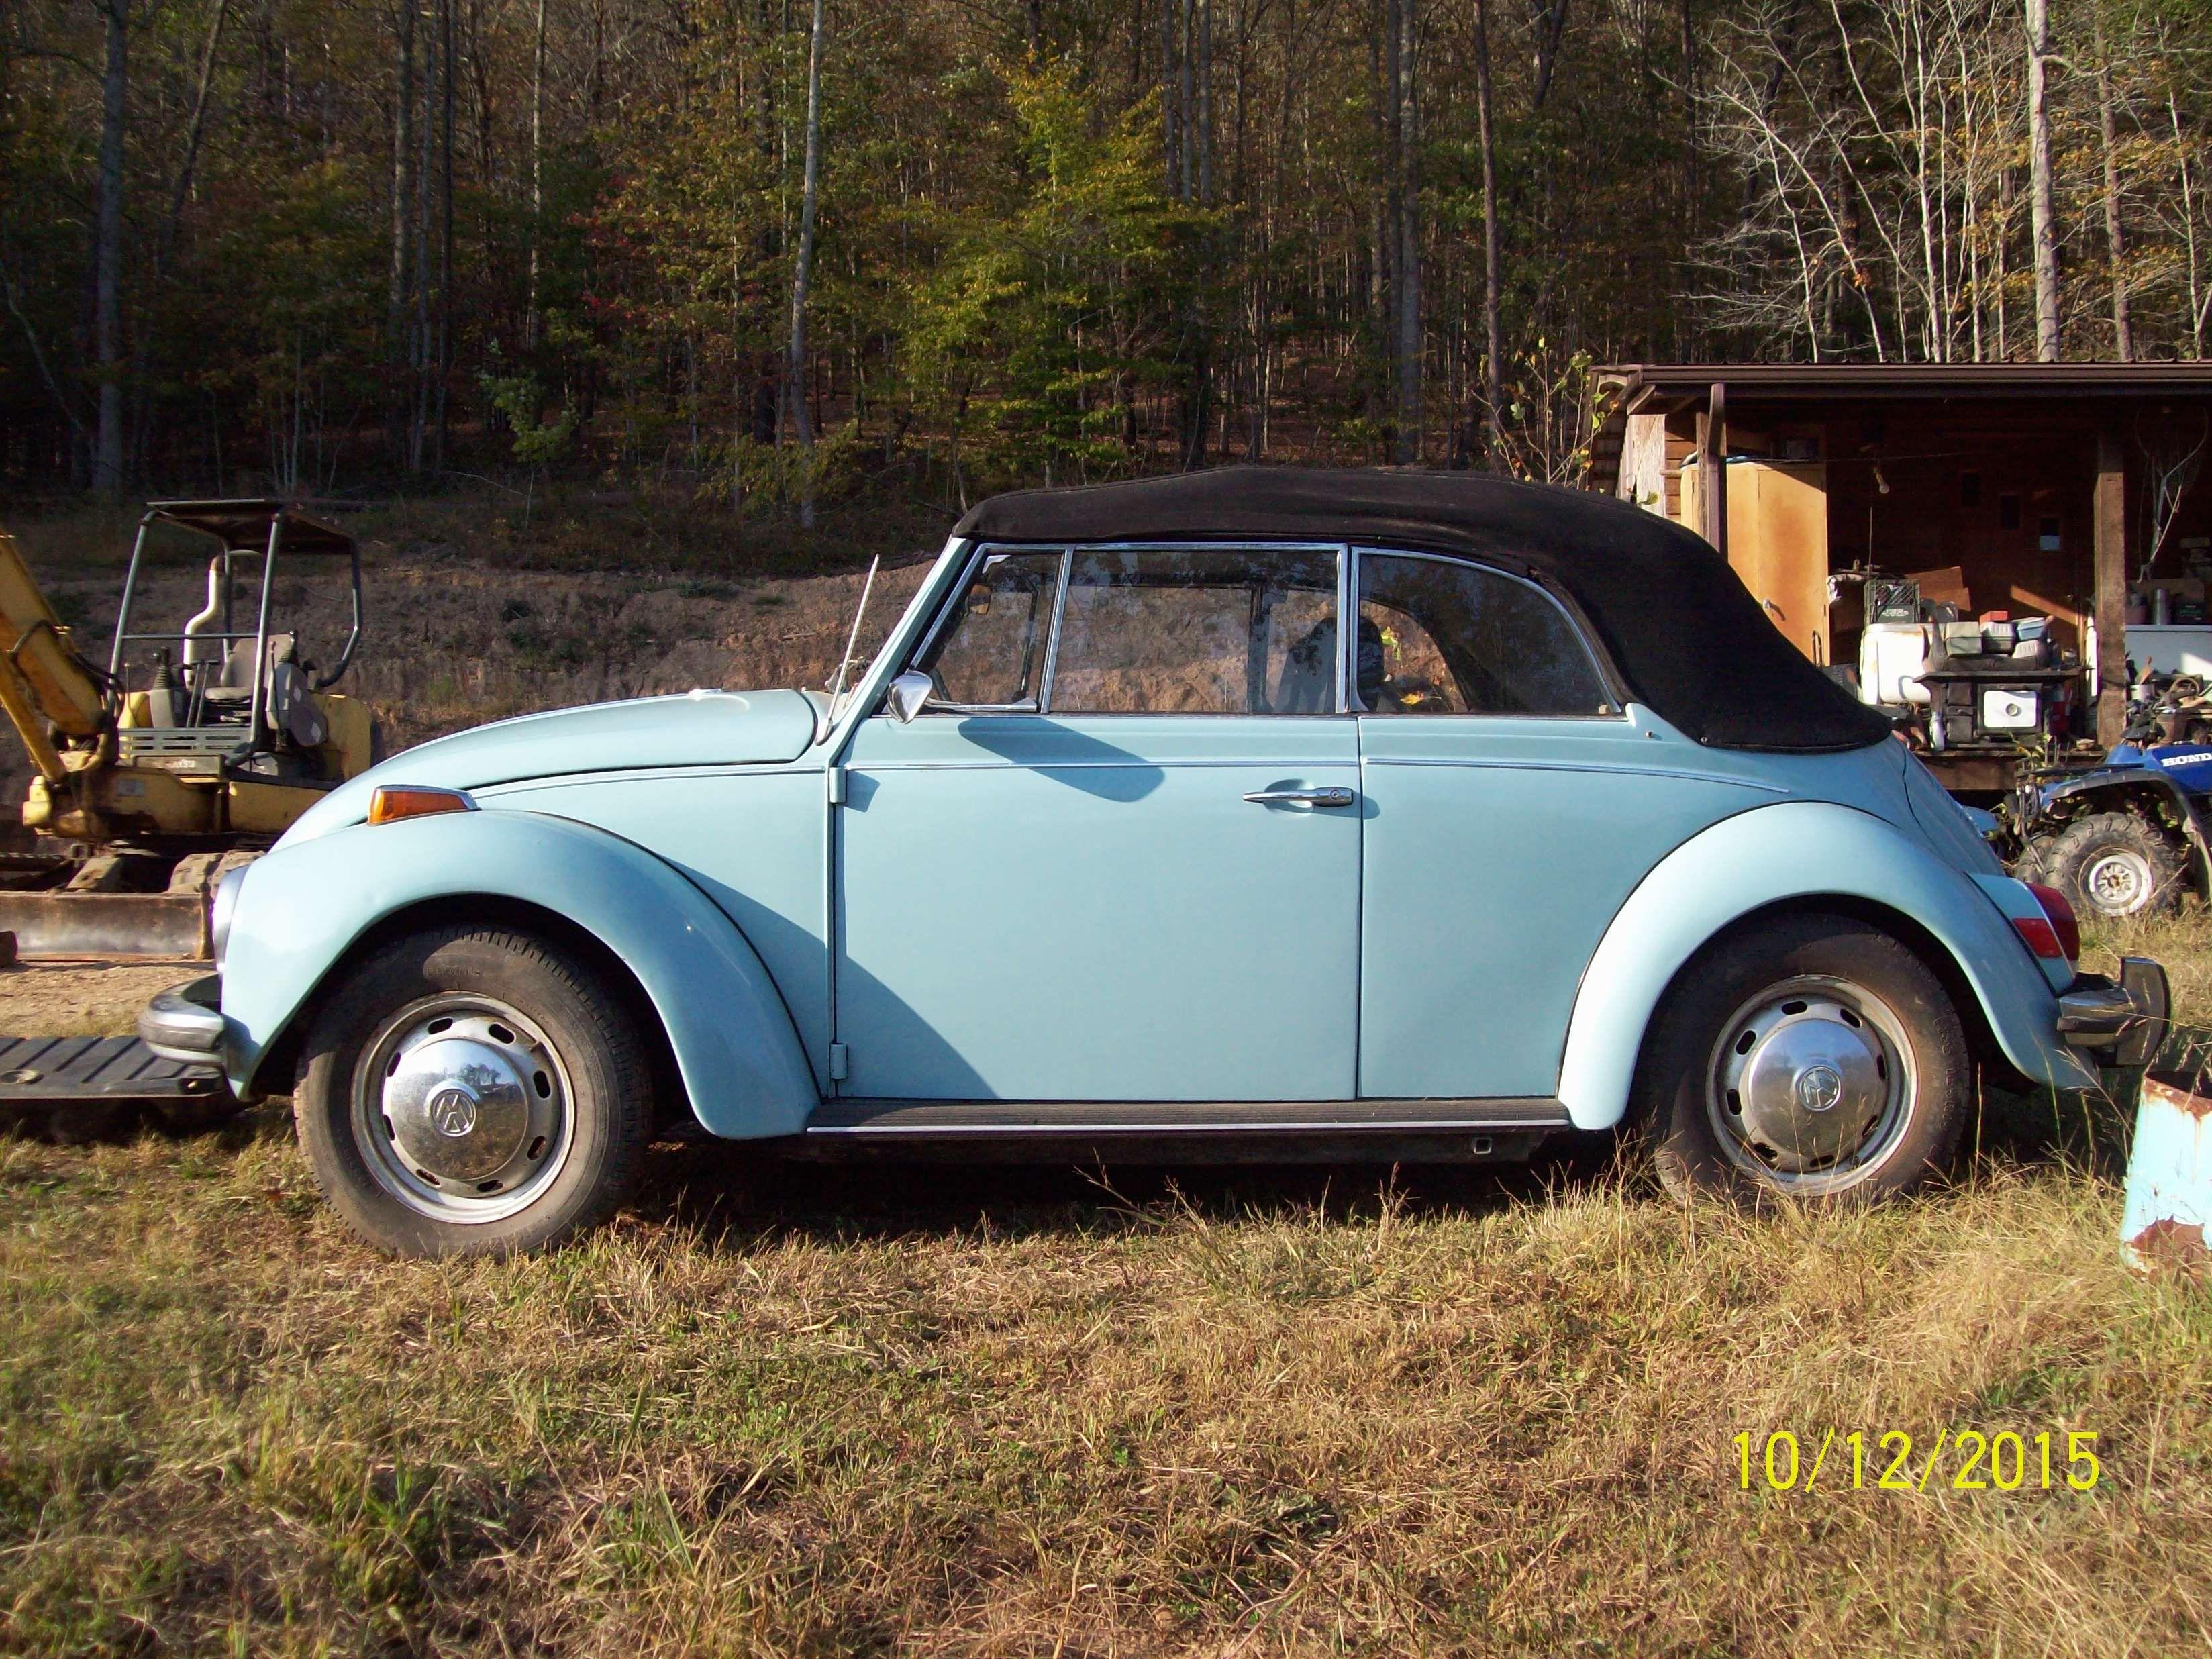 alexs alex beetle craigslist volkswagen ford brazilian maverick blocks rk and nation s big a